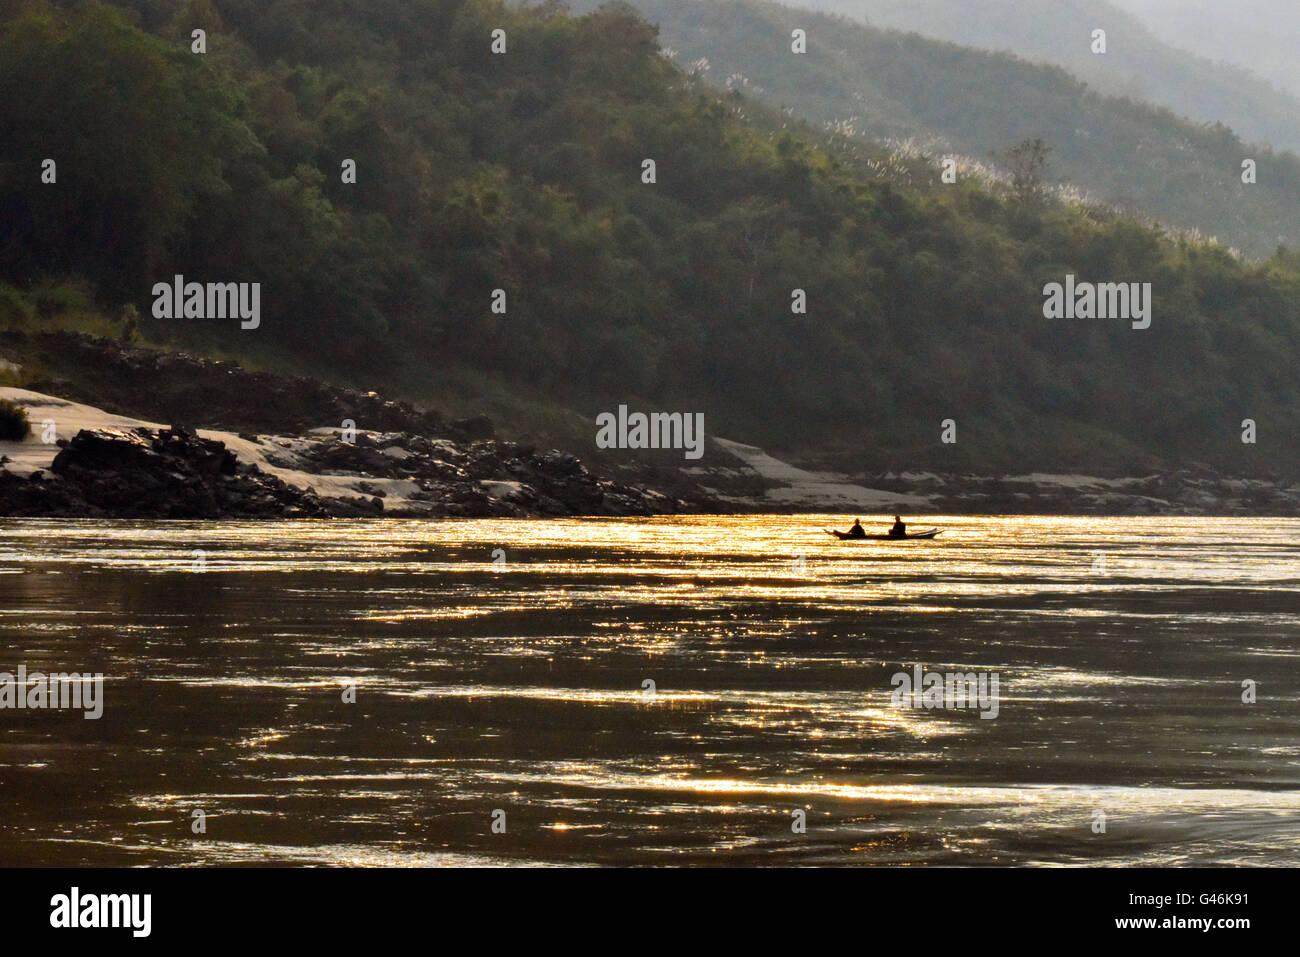 The Mekong river, Laos - Stock Image